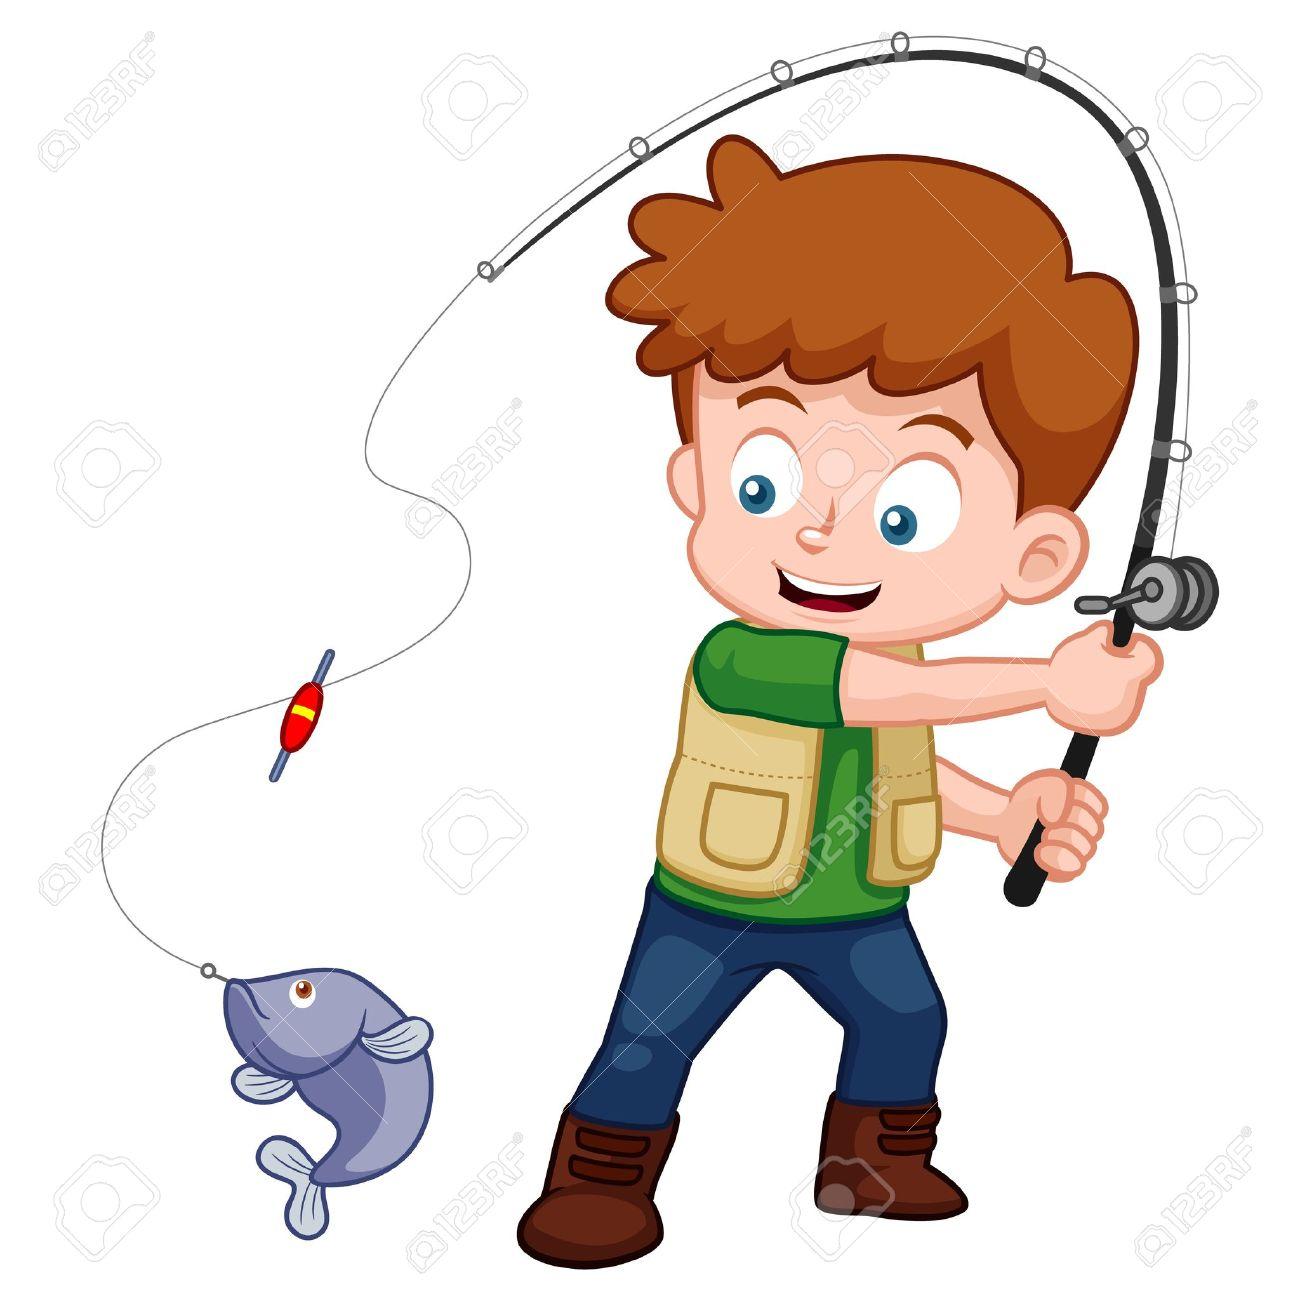 1300x1300 Illustration Of Cartoon Boy Fishing Royalty Free Cliparts, Vectors